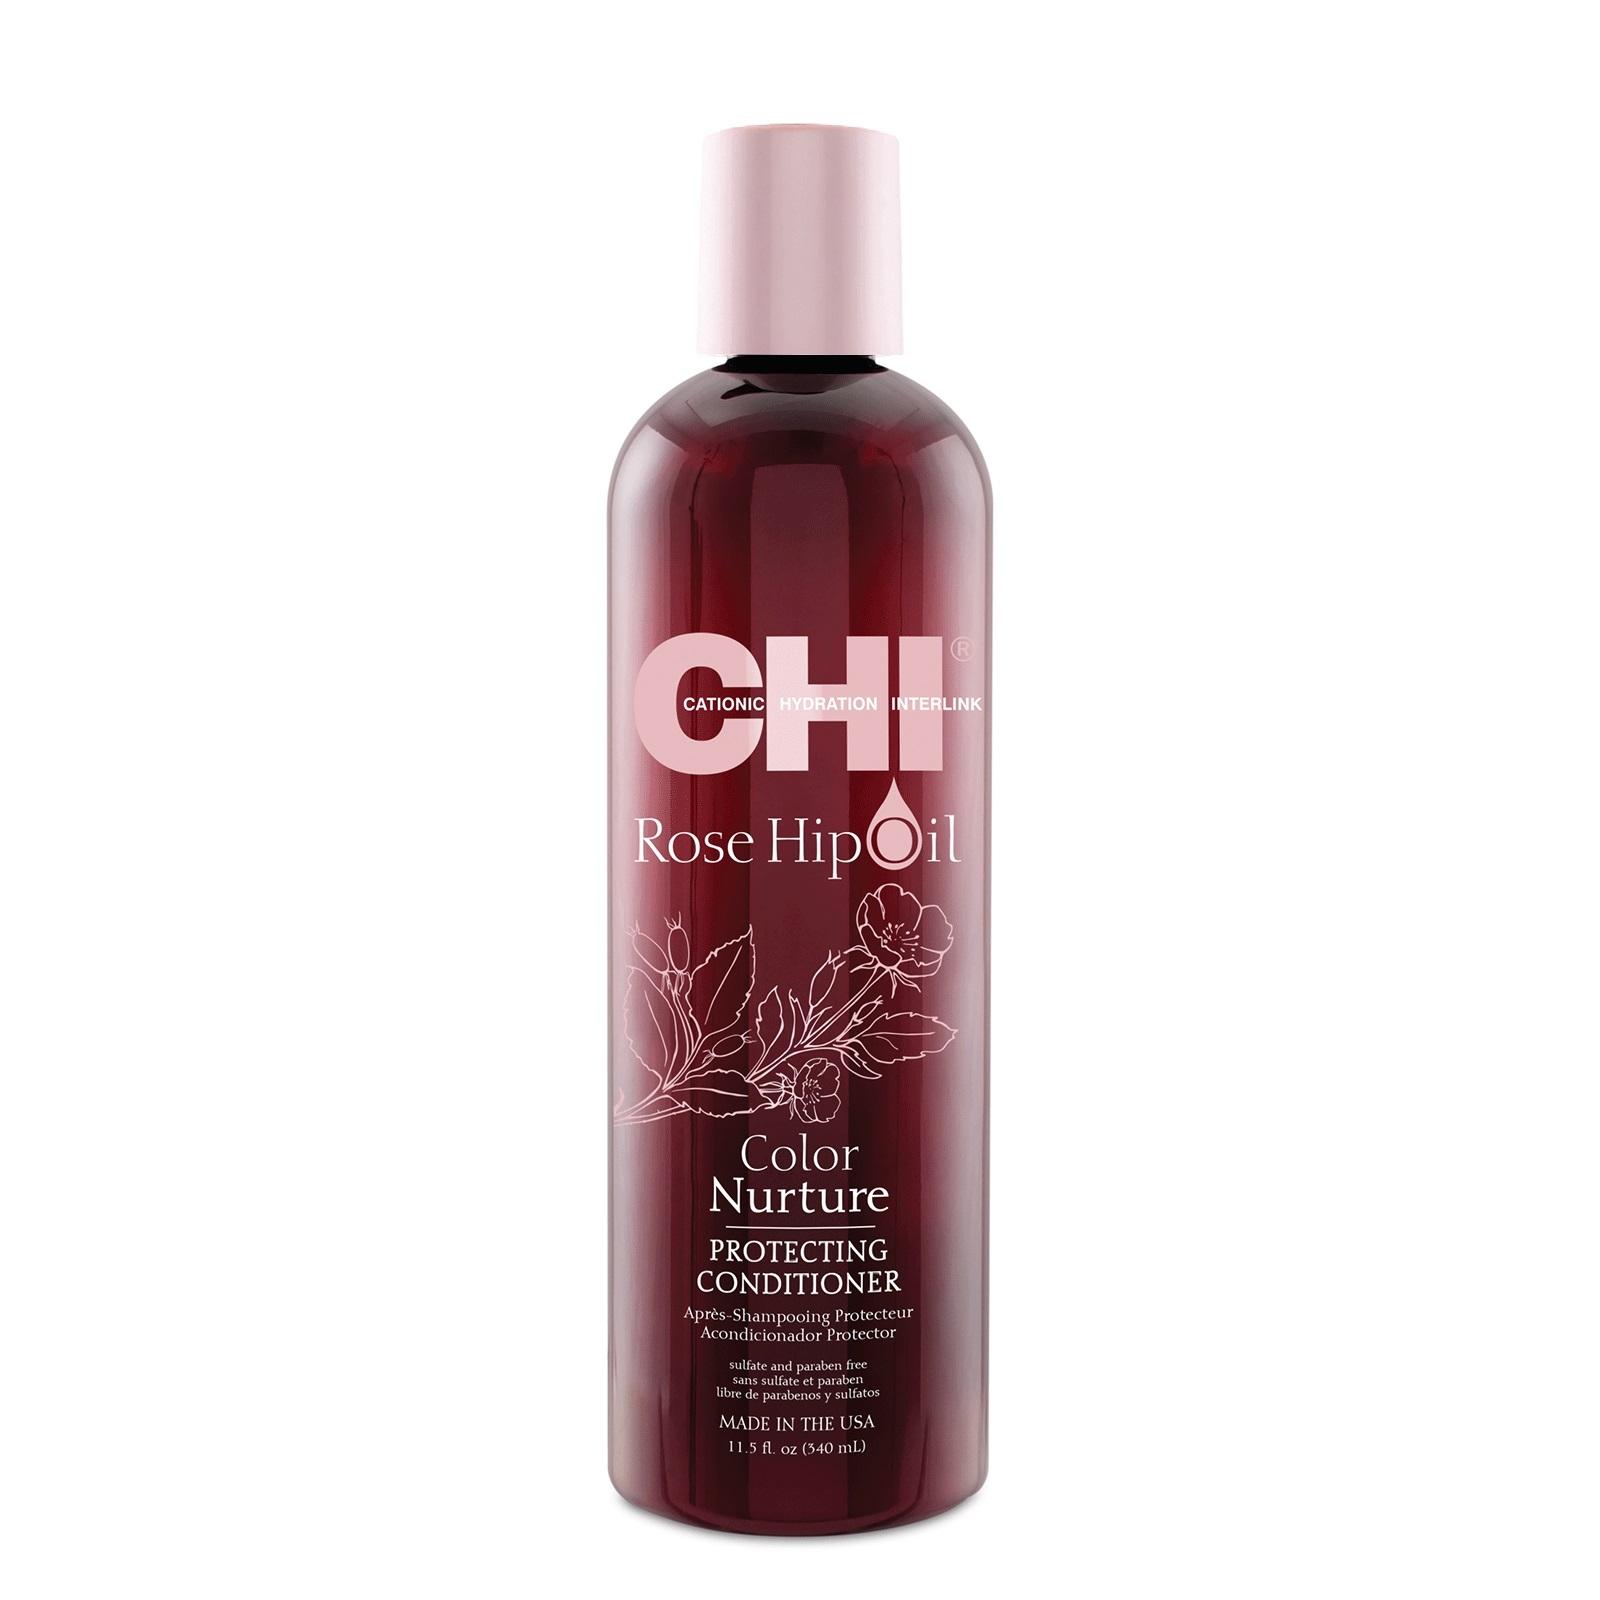 Chi Rose Hip Oil Color Nurture Protecting Conditioner 340ml